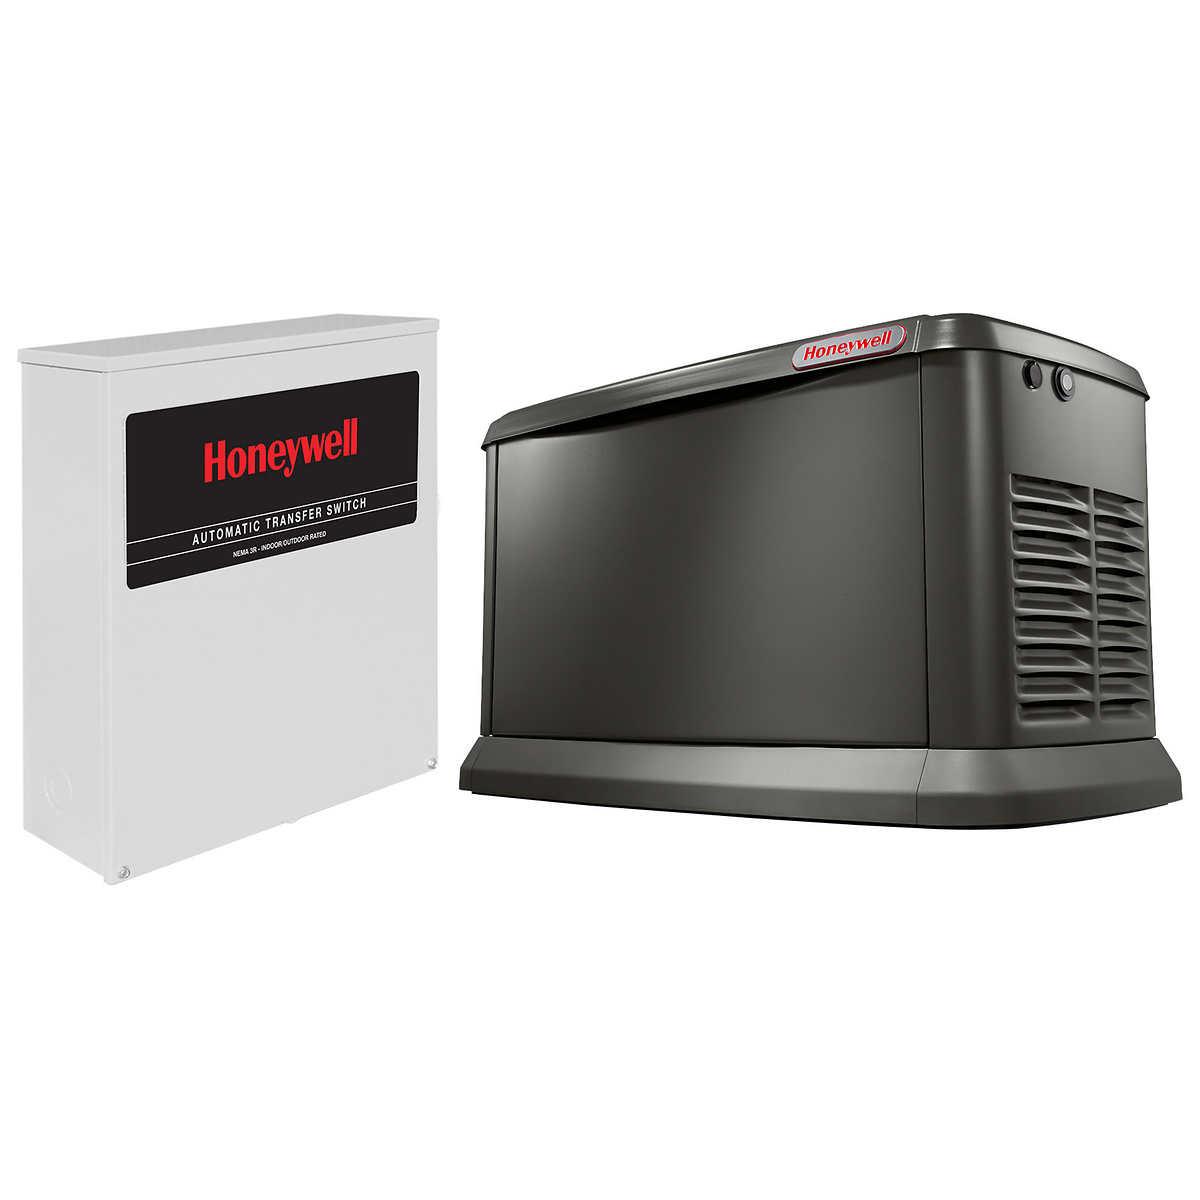 Honeywell by Generac 20 kW Automatic Standby Generator with Wi-Fi & 200 A  Transfer Switch